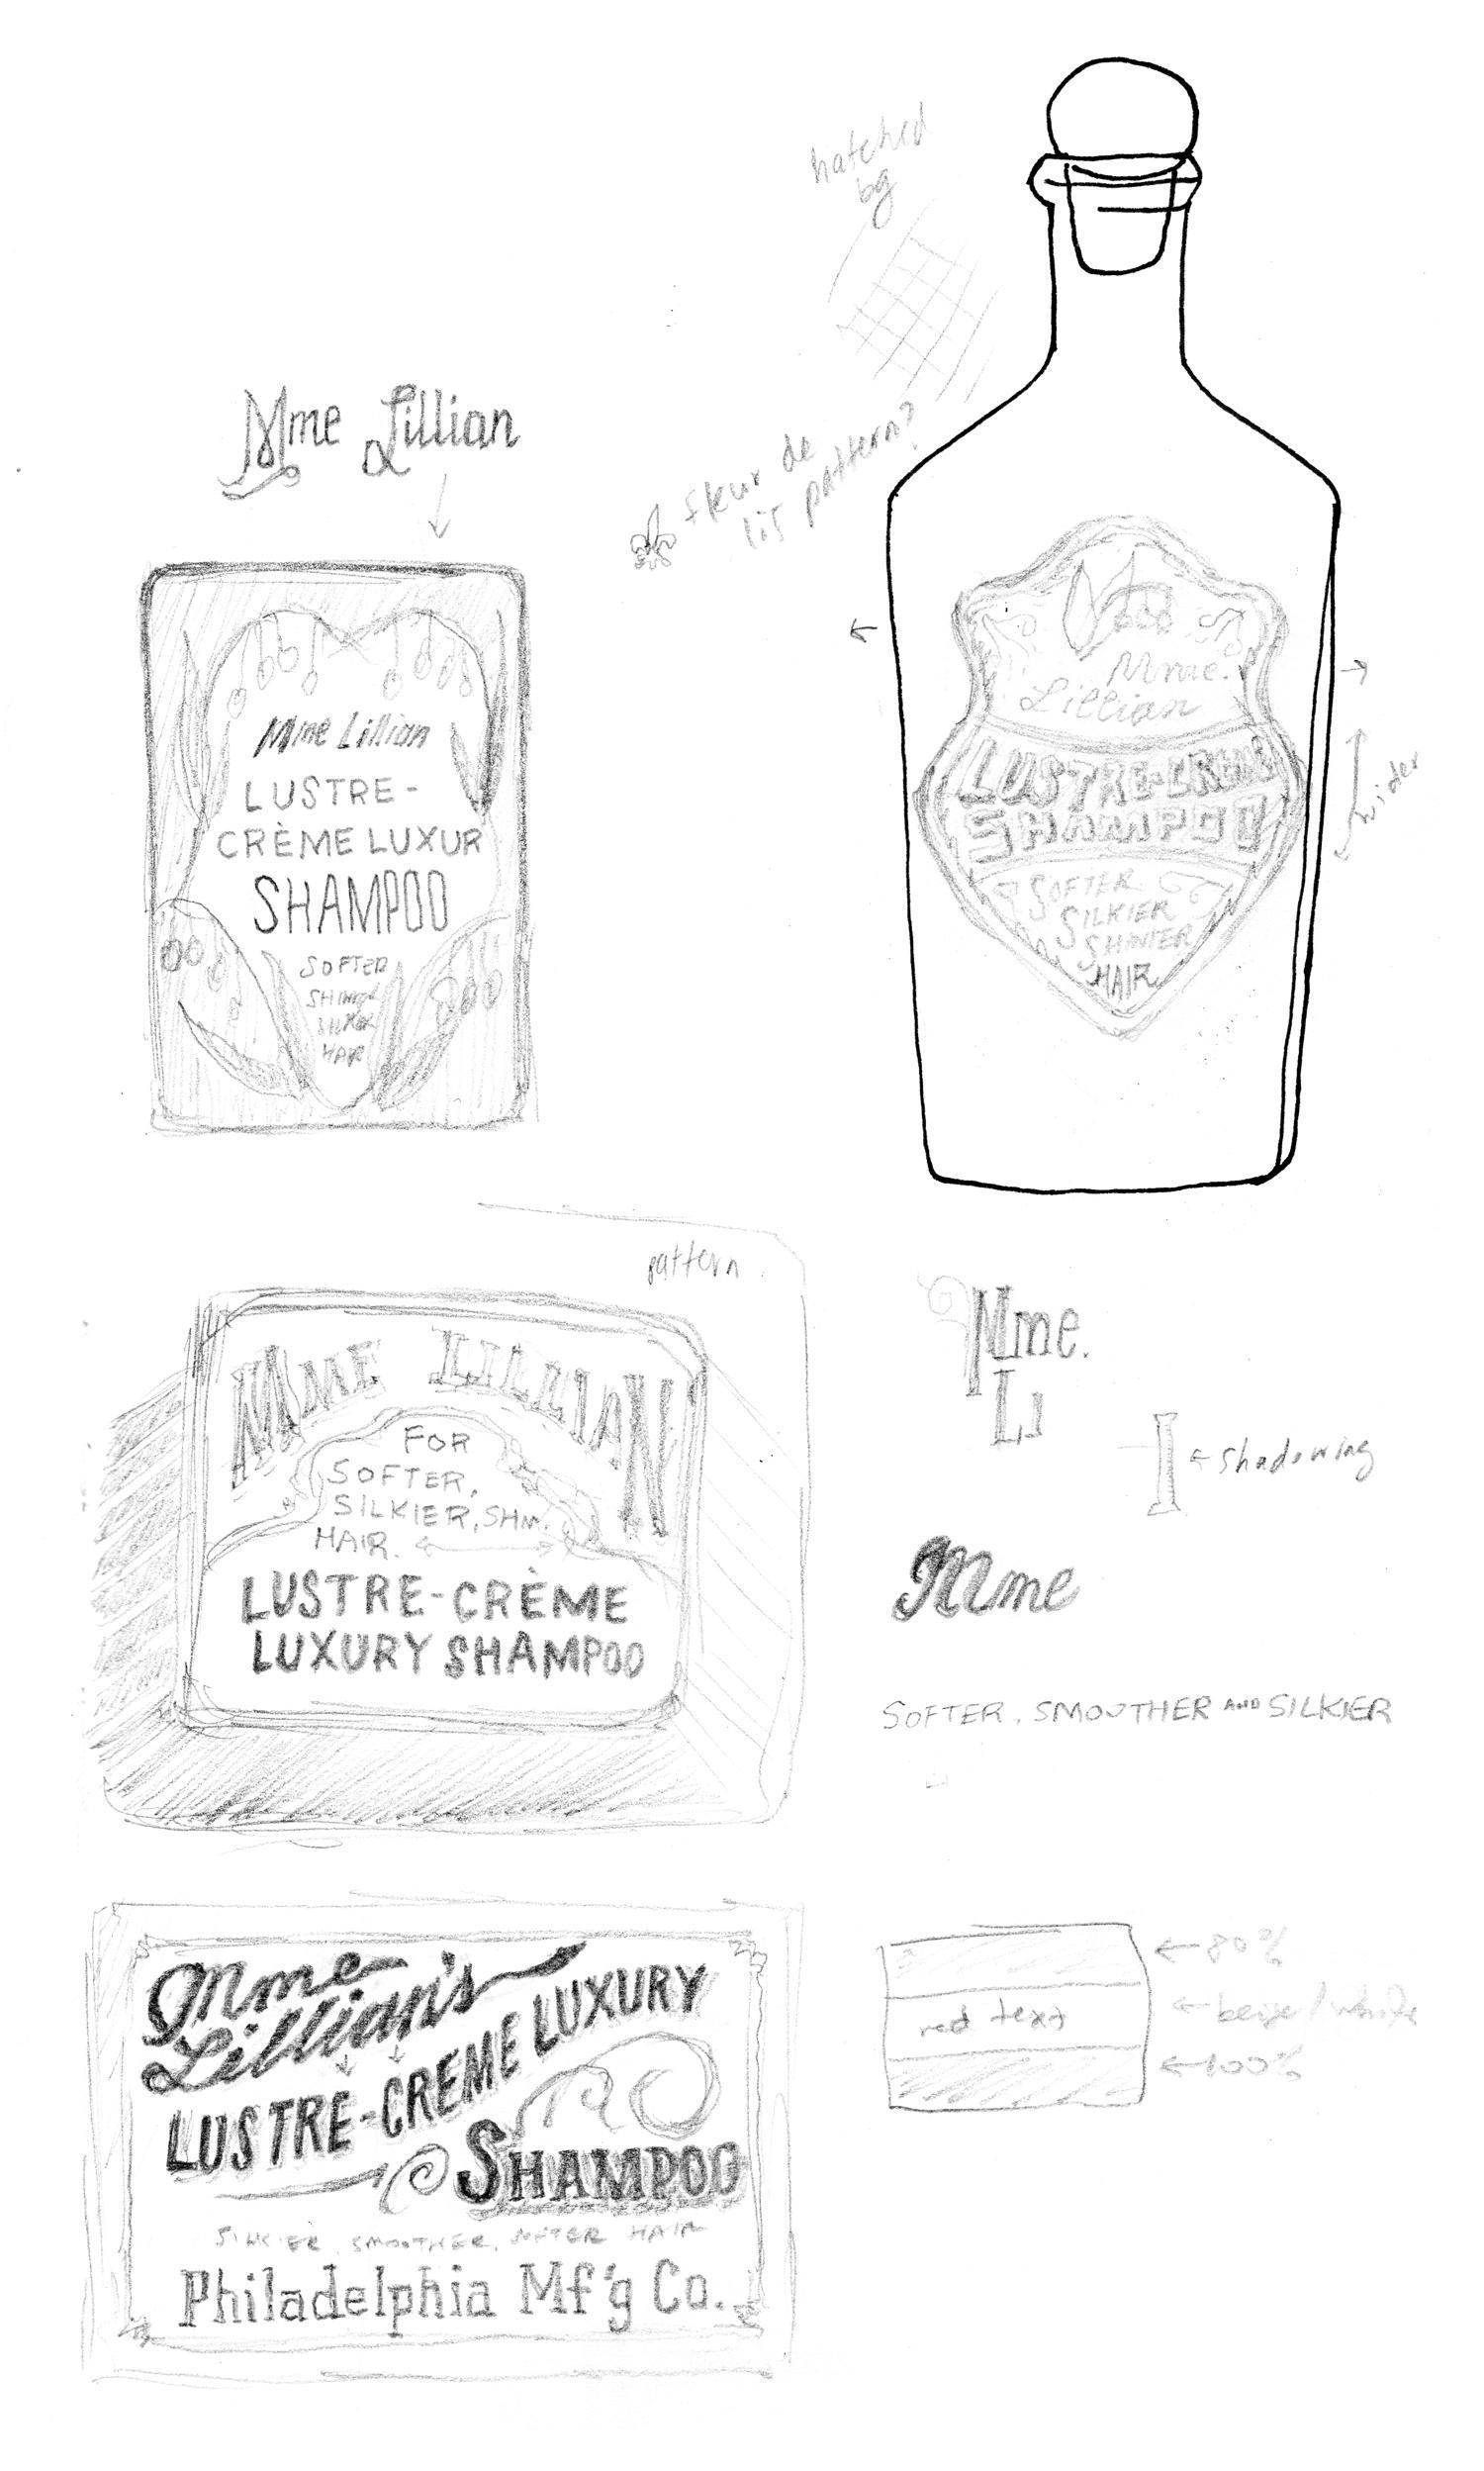 Madame Lillian's Shampoo - image 3 - student project